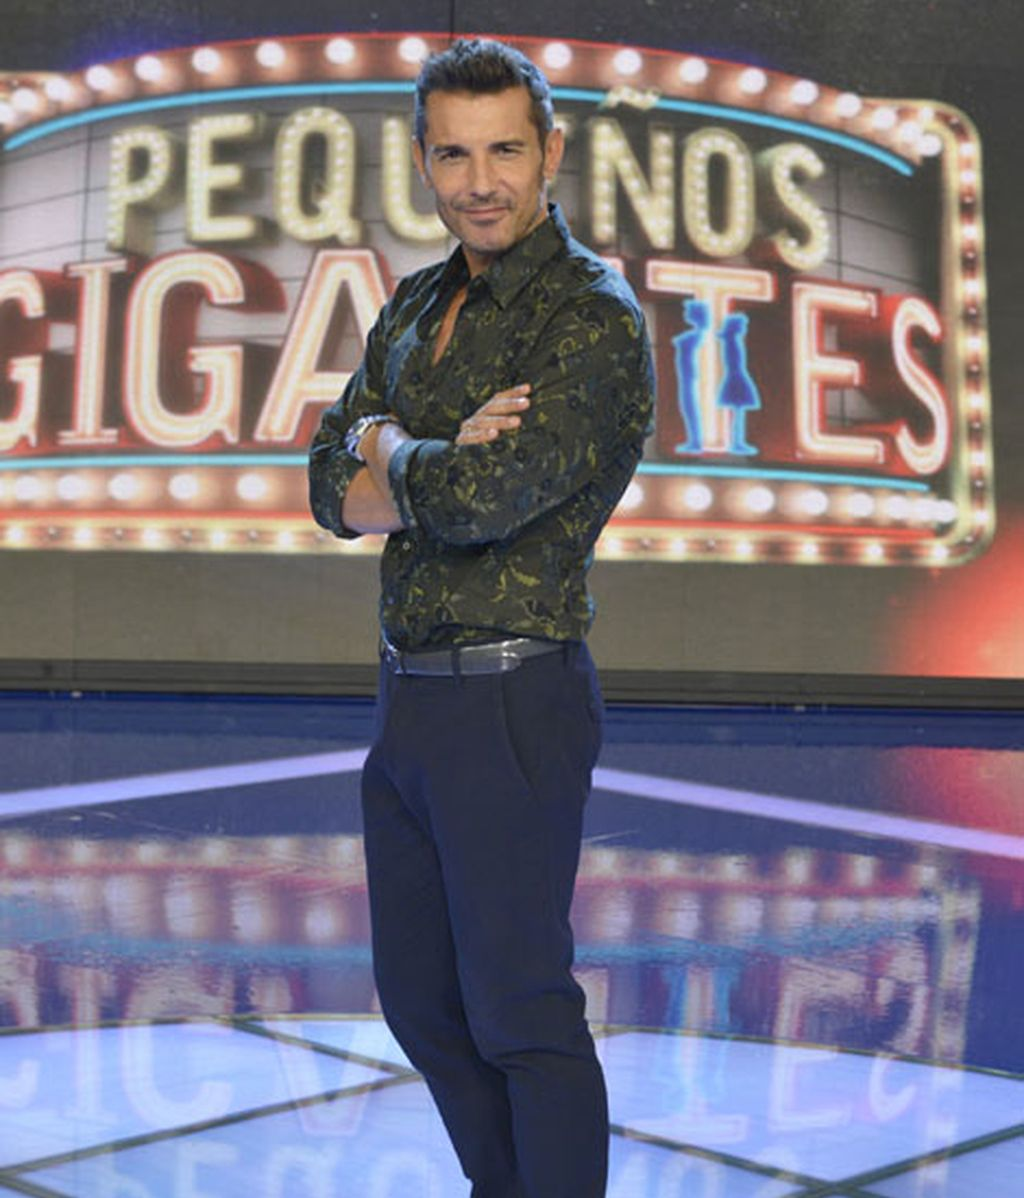 Jesús Vázquez, al frente de 'Pequeños gigantes'